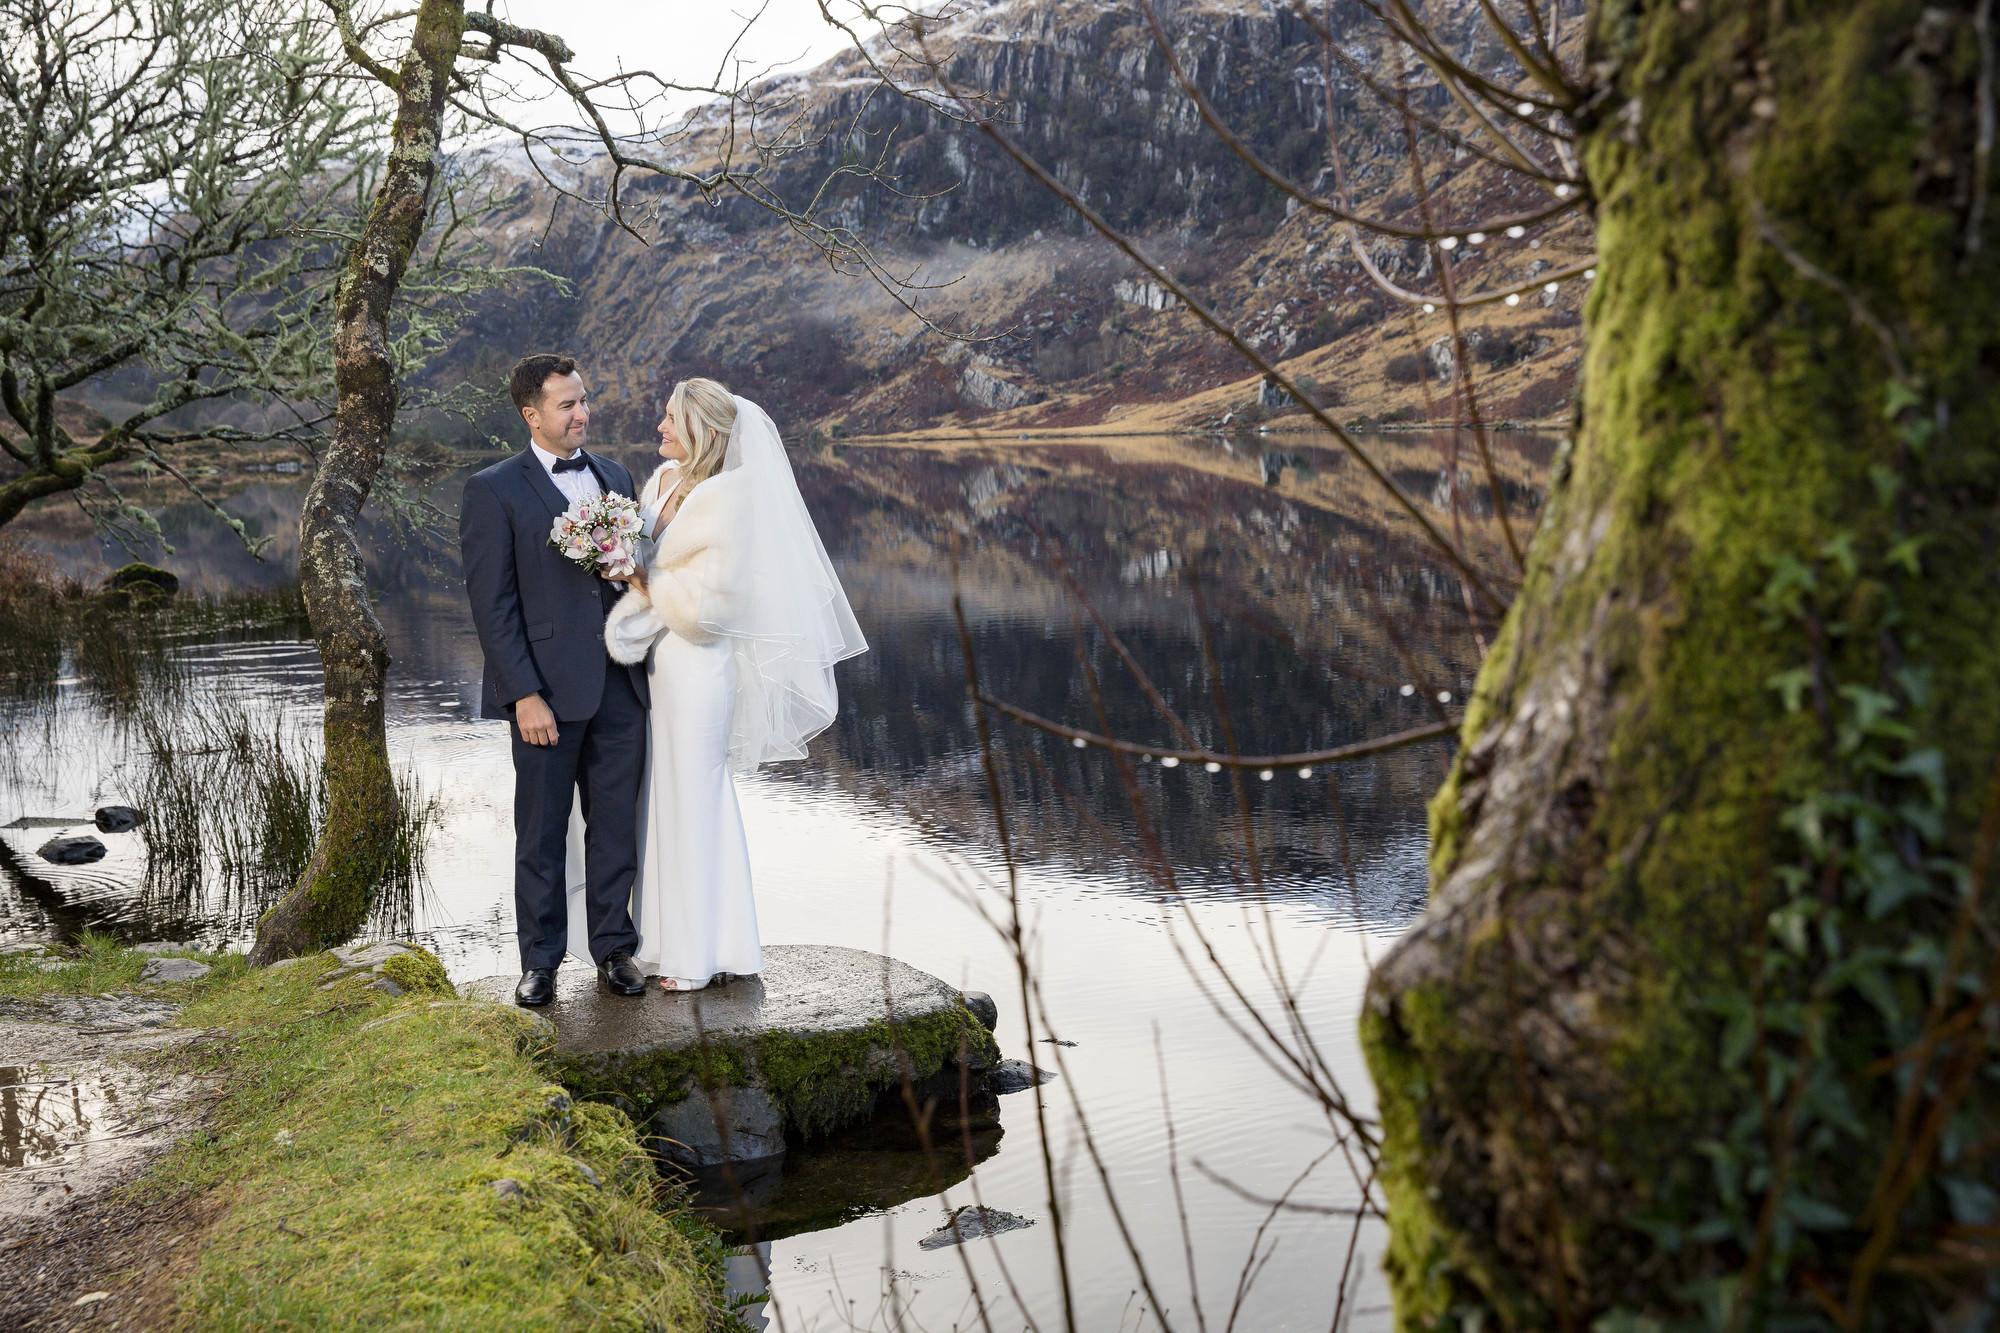 muckross_park_hotel_grougane_barra_wedding_photographer_goldenmoments_045.jpg